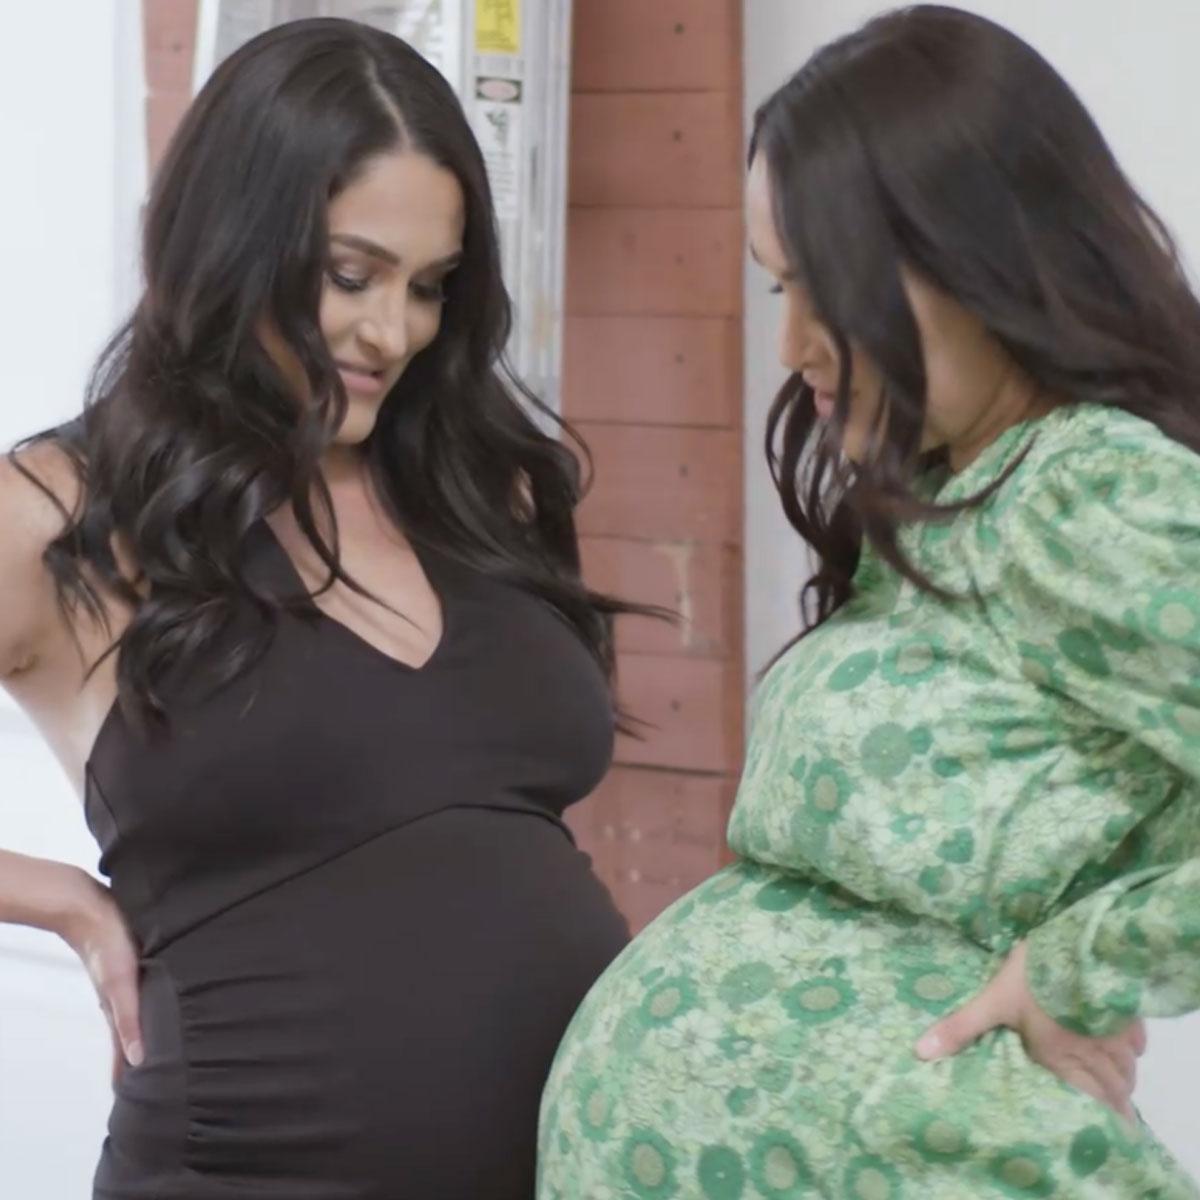 First Look at Total Bellas Season 6: Brie & Nikki Bella Are Pregnant Mid-Pandemic